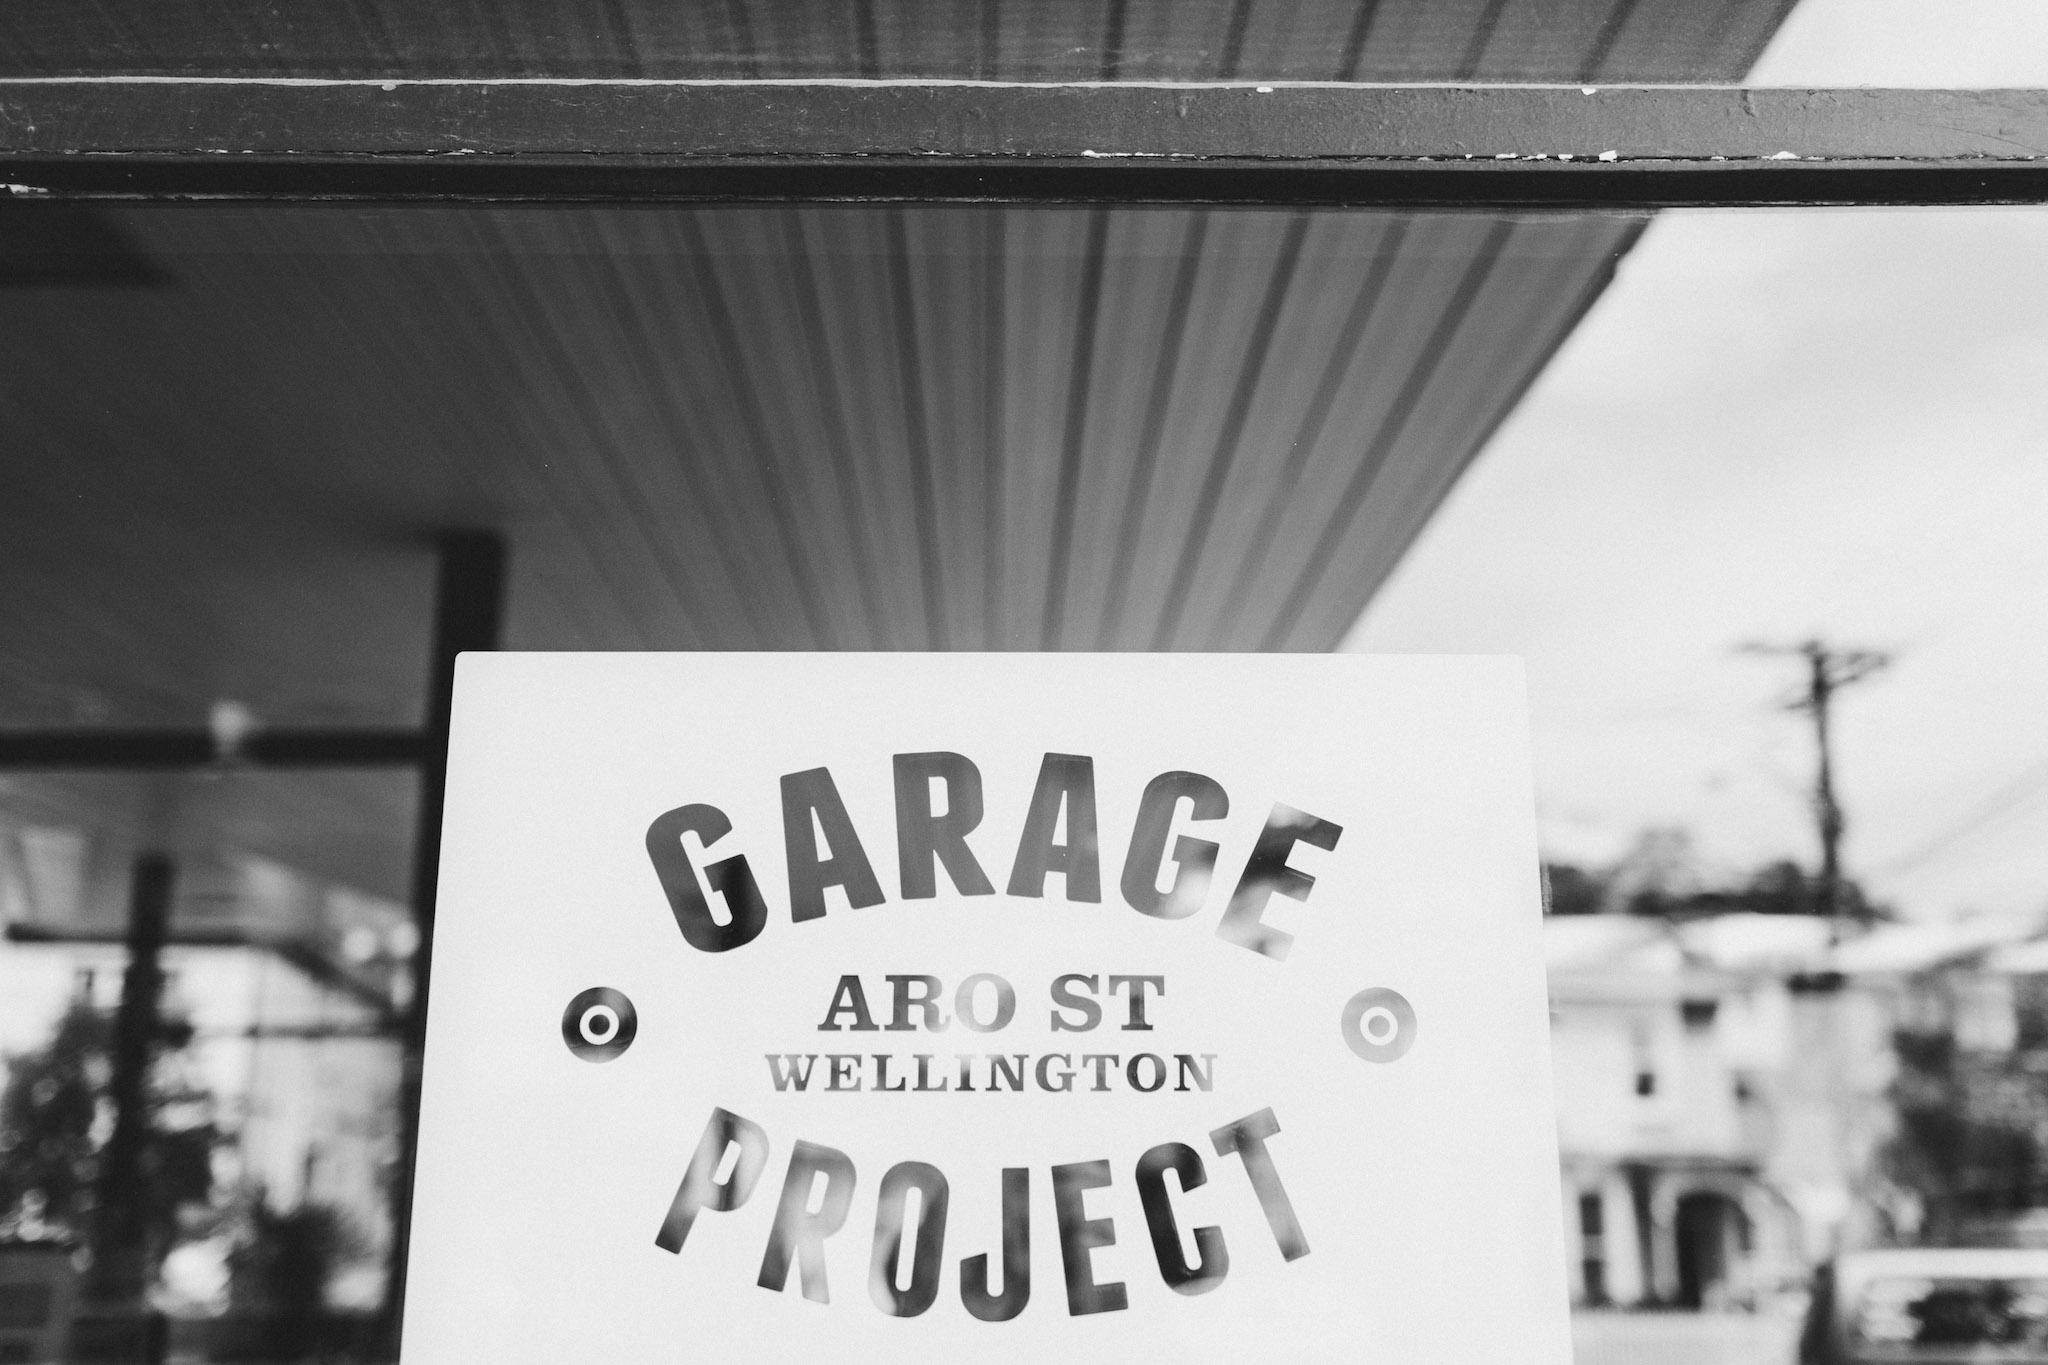 Garage Project 2015 Beer.jpeg